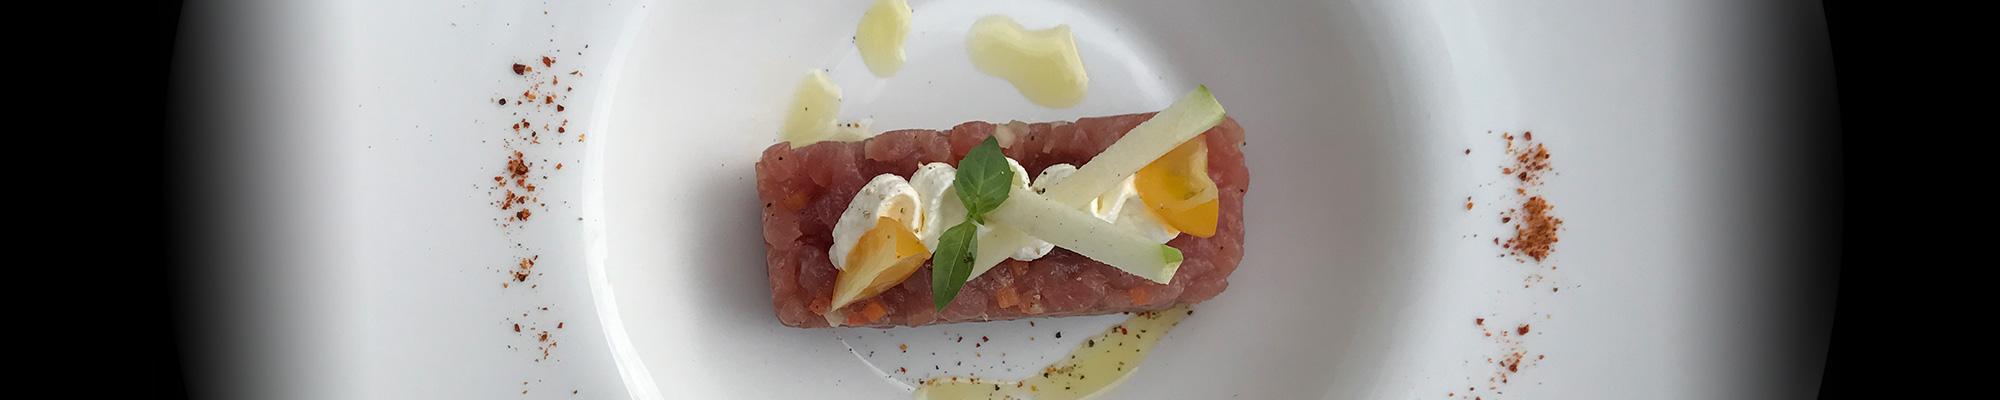 https://www.maurotraiteur.com/wp-content/uploads/2017/10/mauro-traiteur-gastronomie-italienne-1.jpg